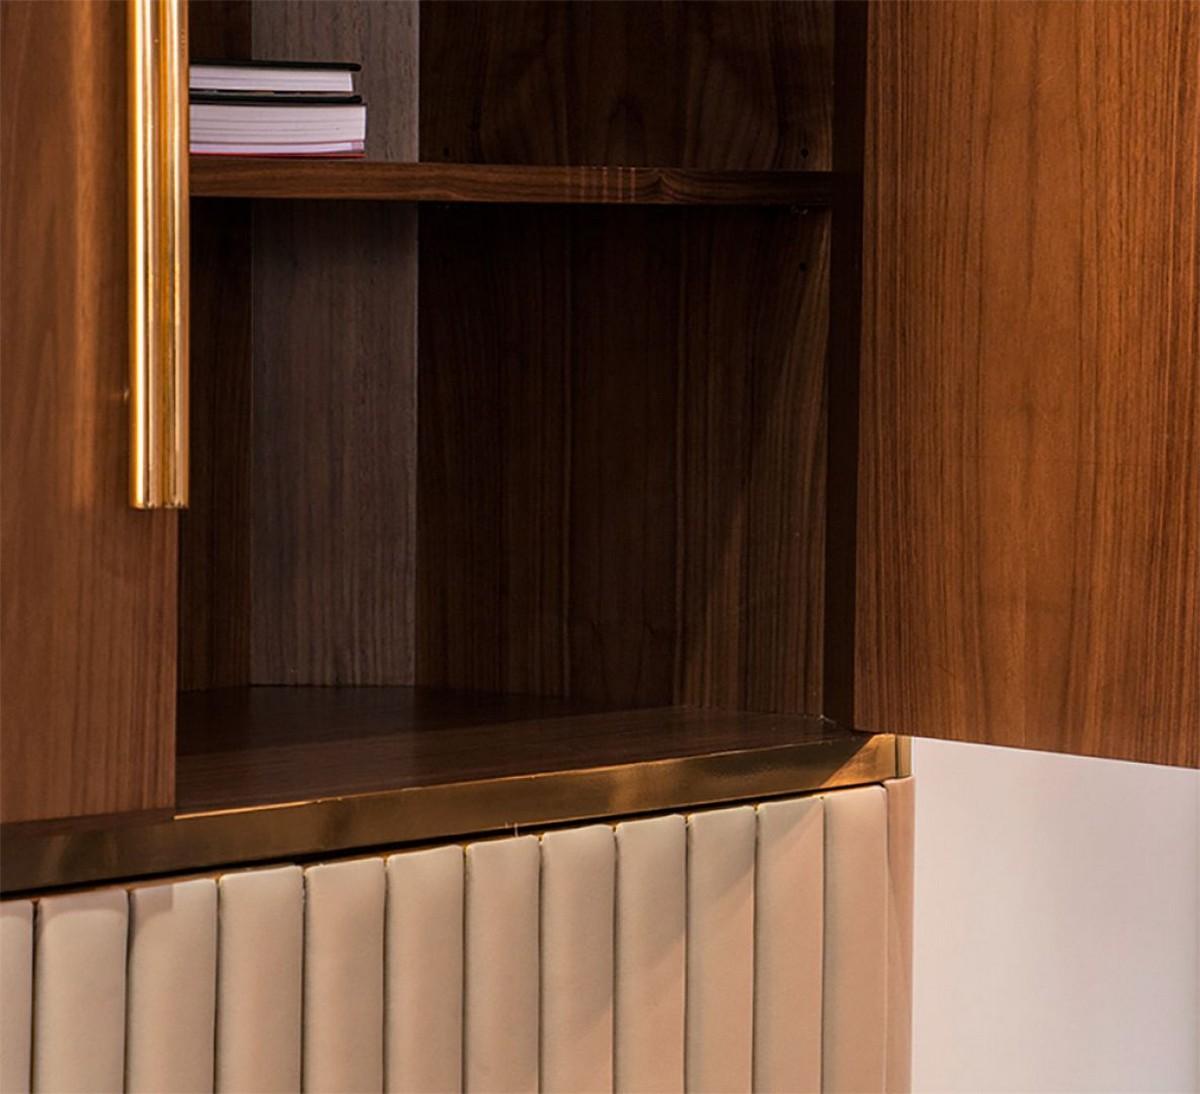 The Hepburn Cabinet: A Magnificent Mid-century Design